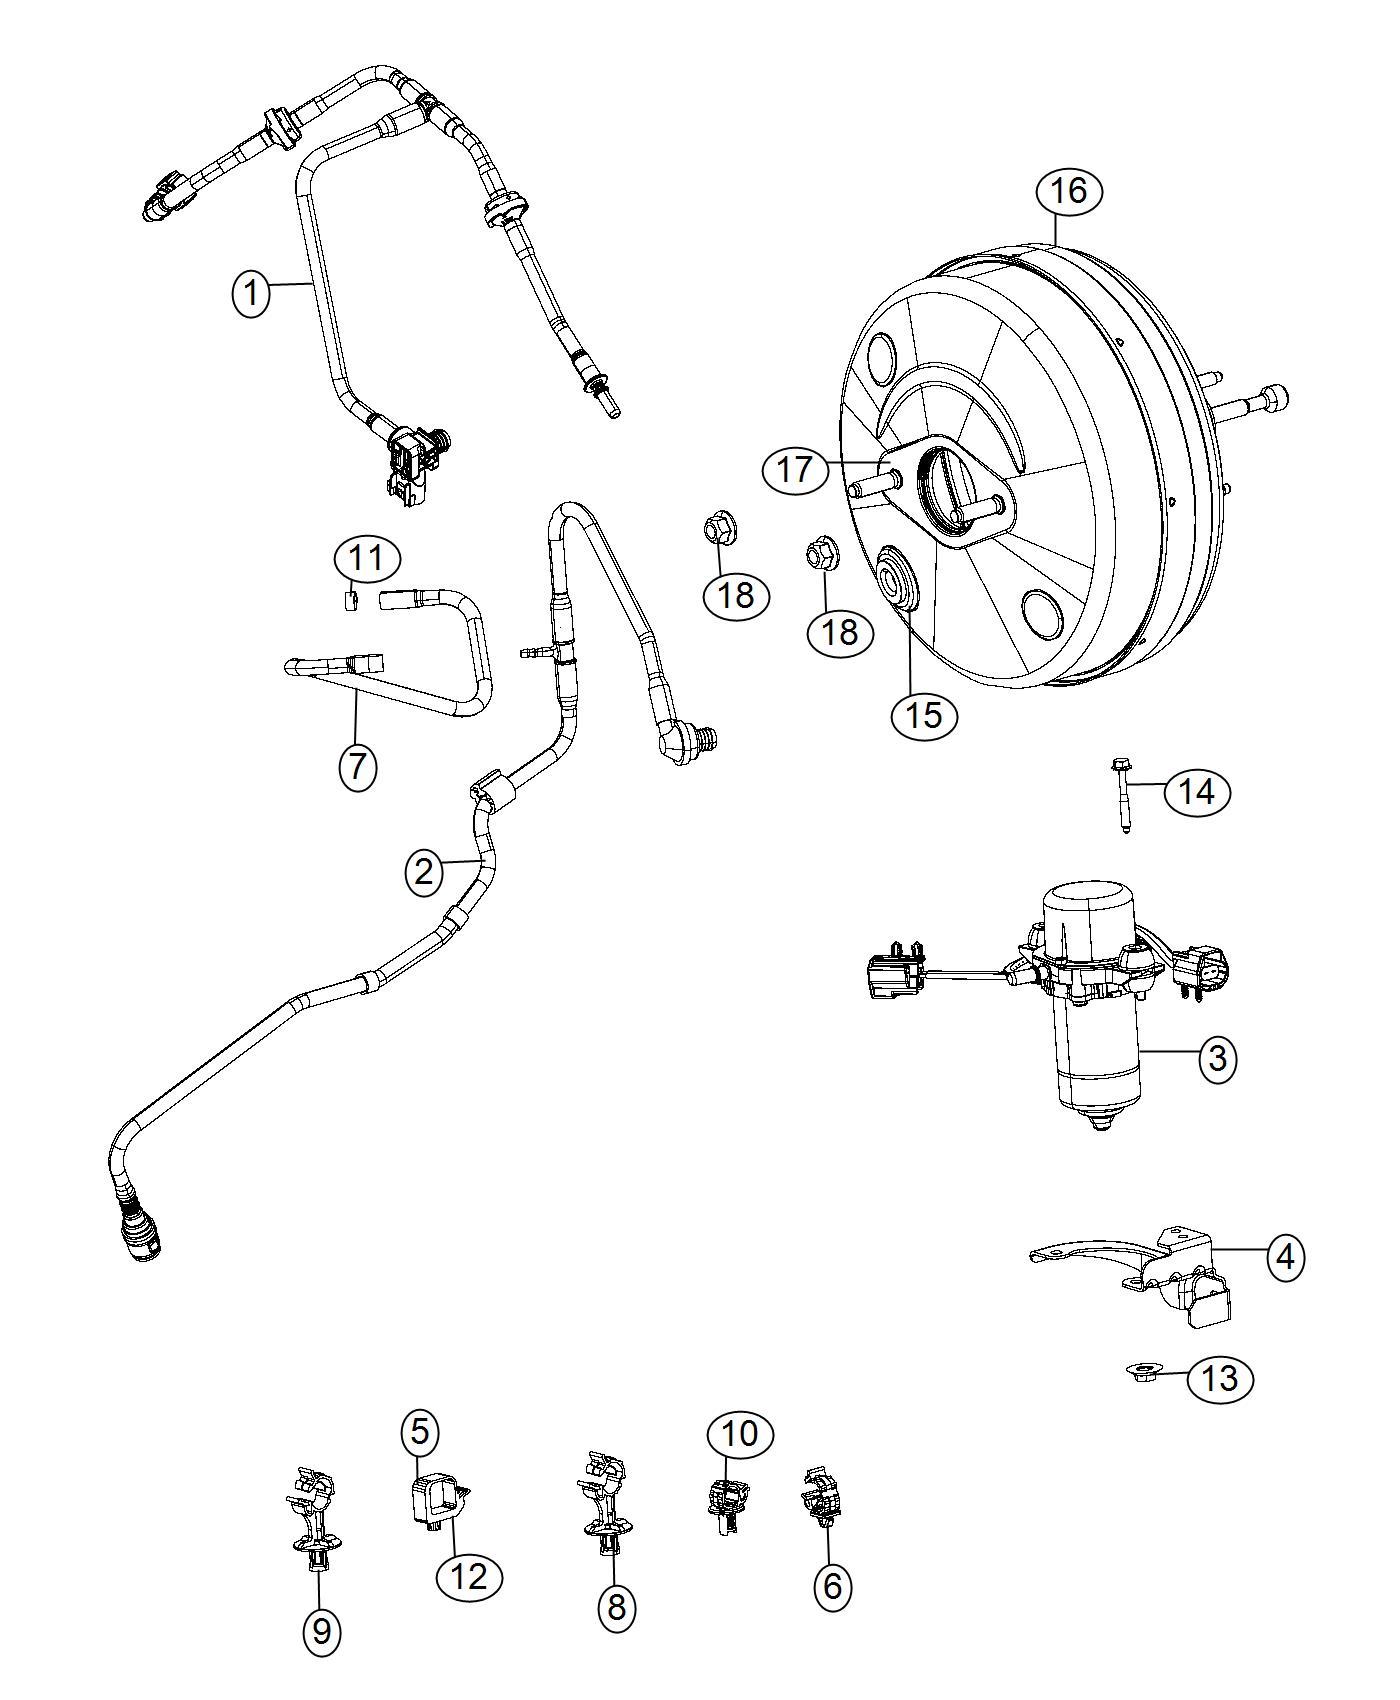 Dodge Ram Booster Power Brake Hydraulic